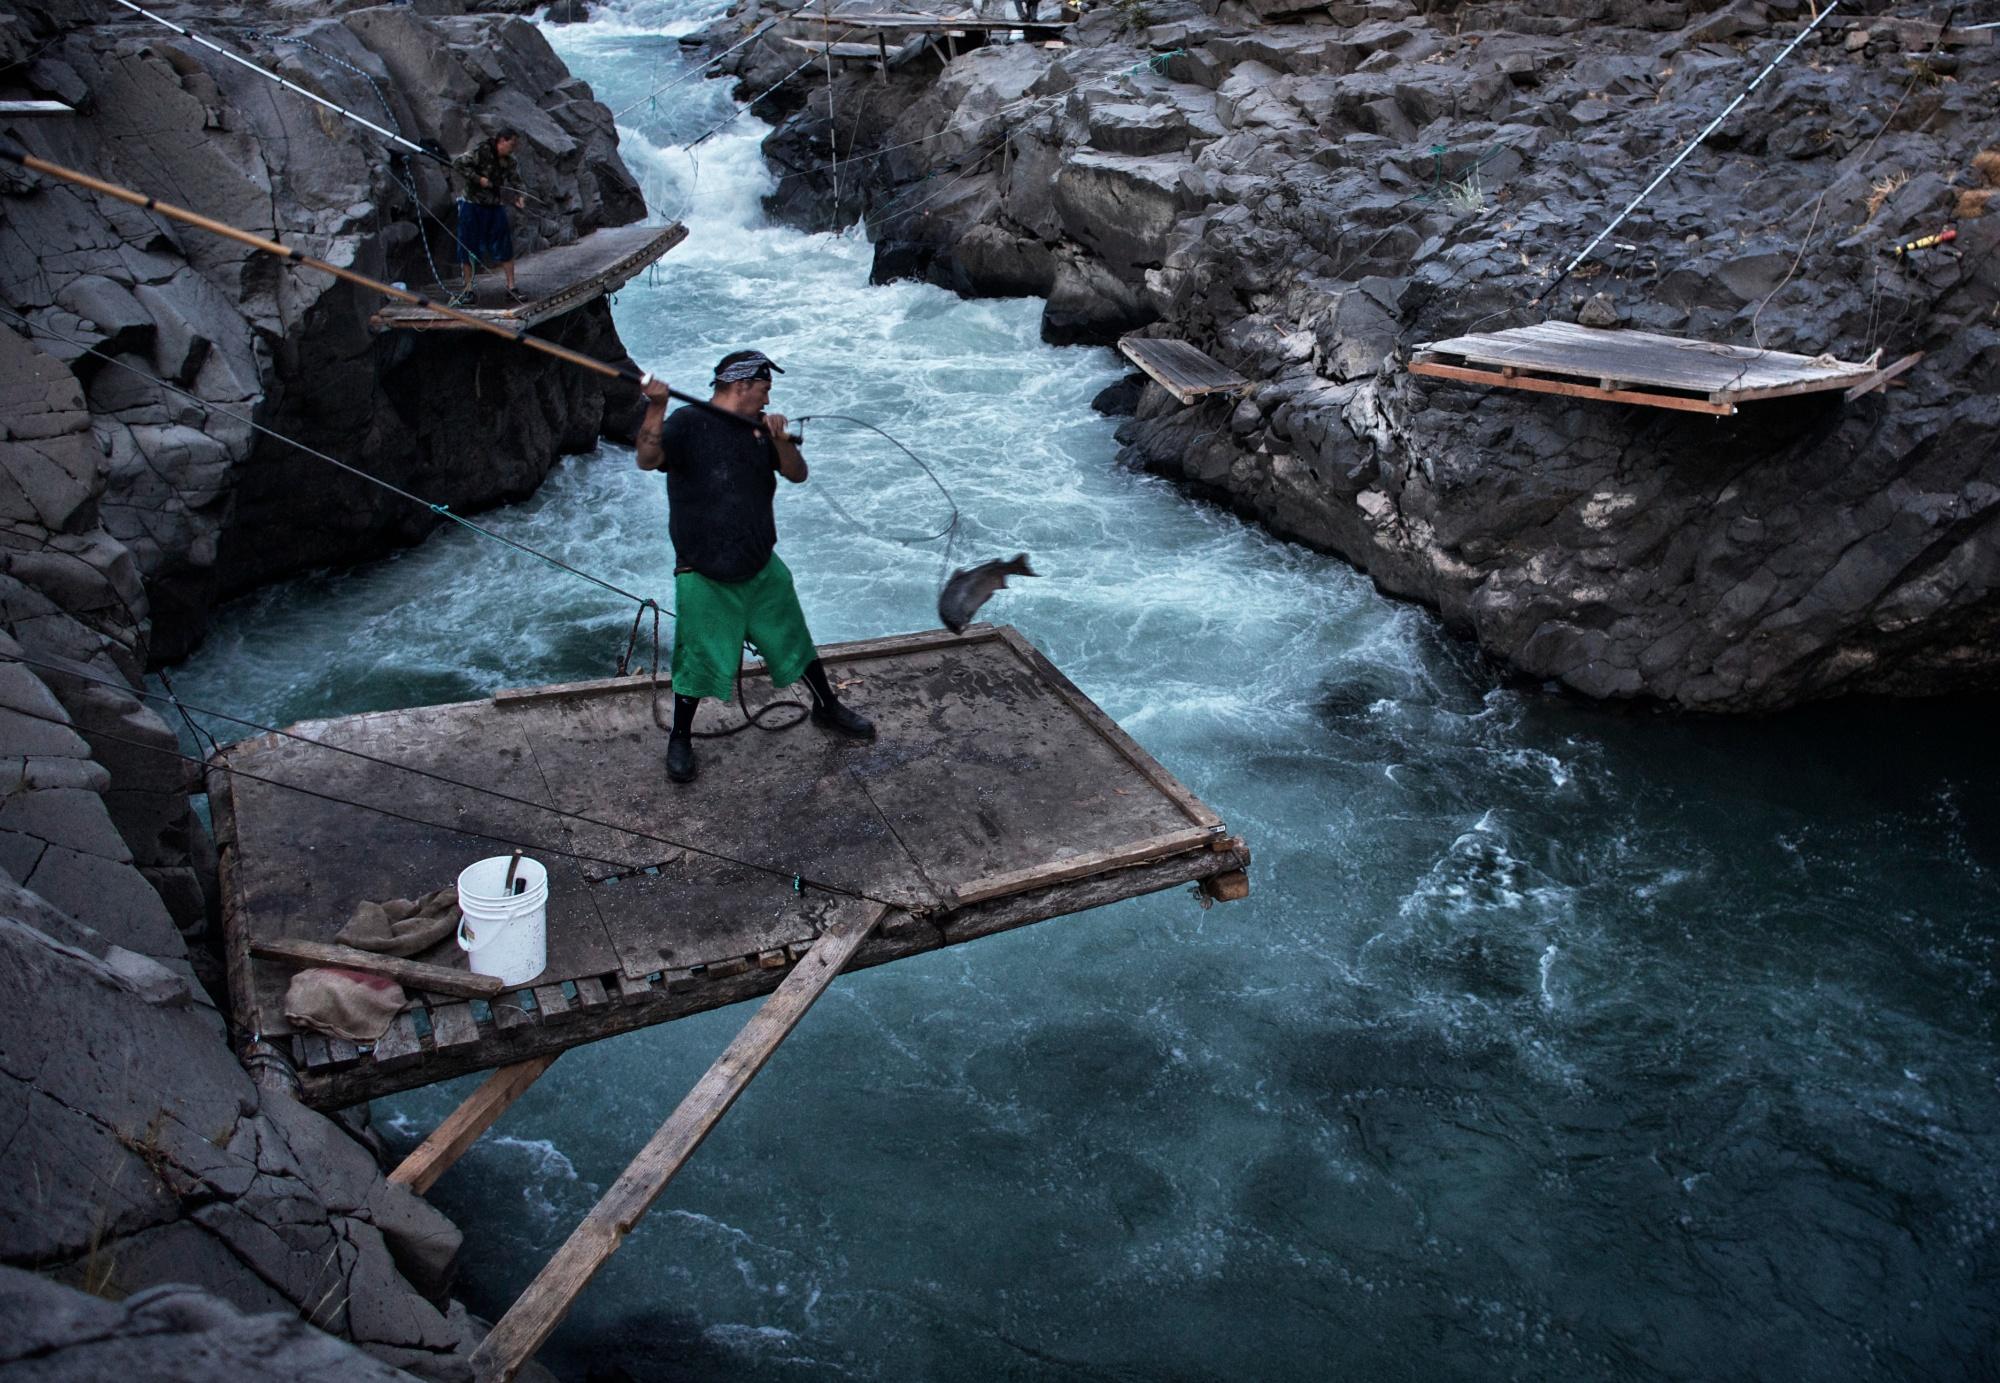 Dip-netting on the Klickitat River.  Thomas Boyd/The Oregonian